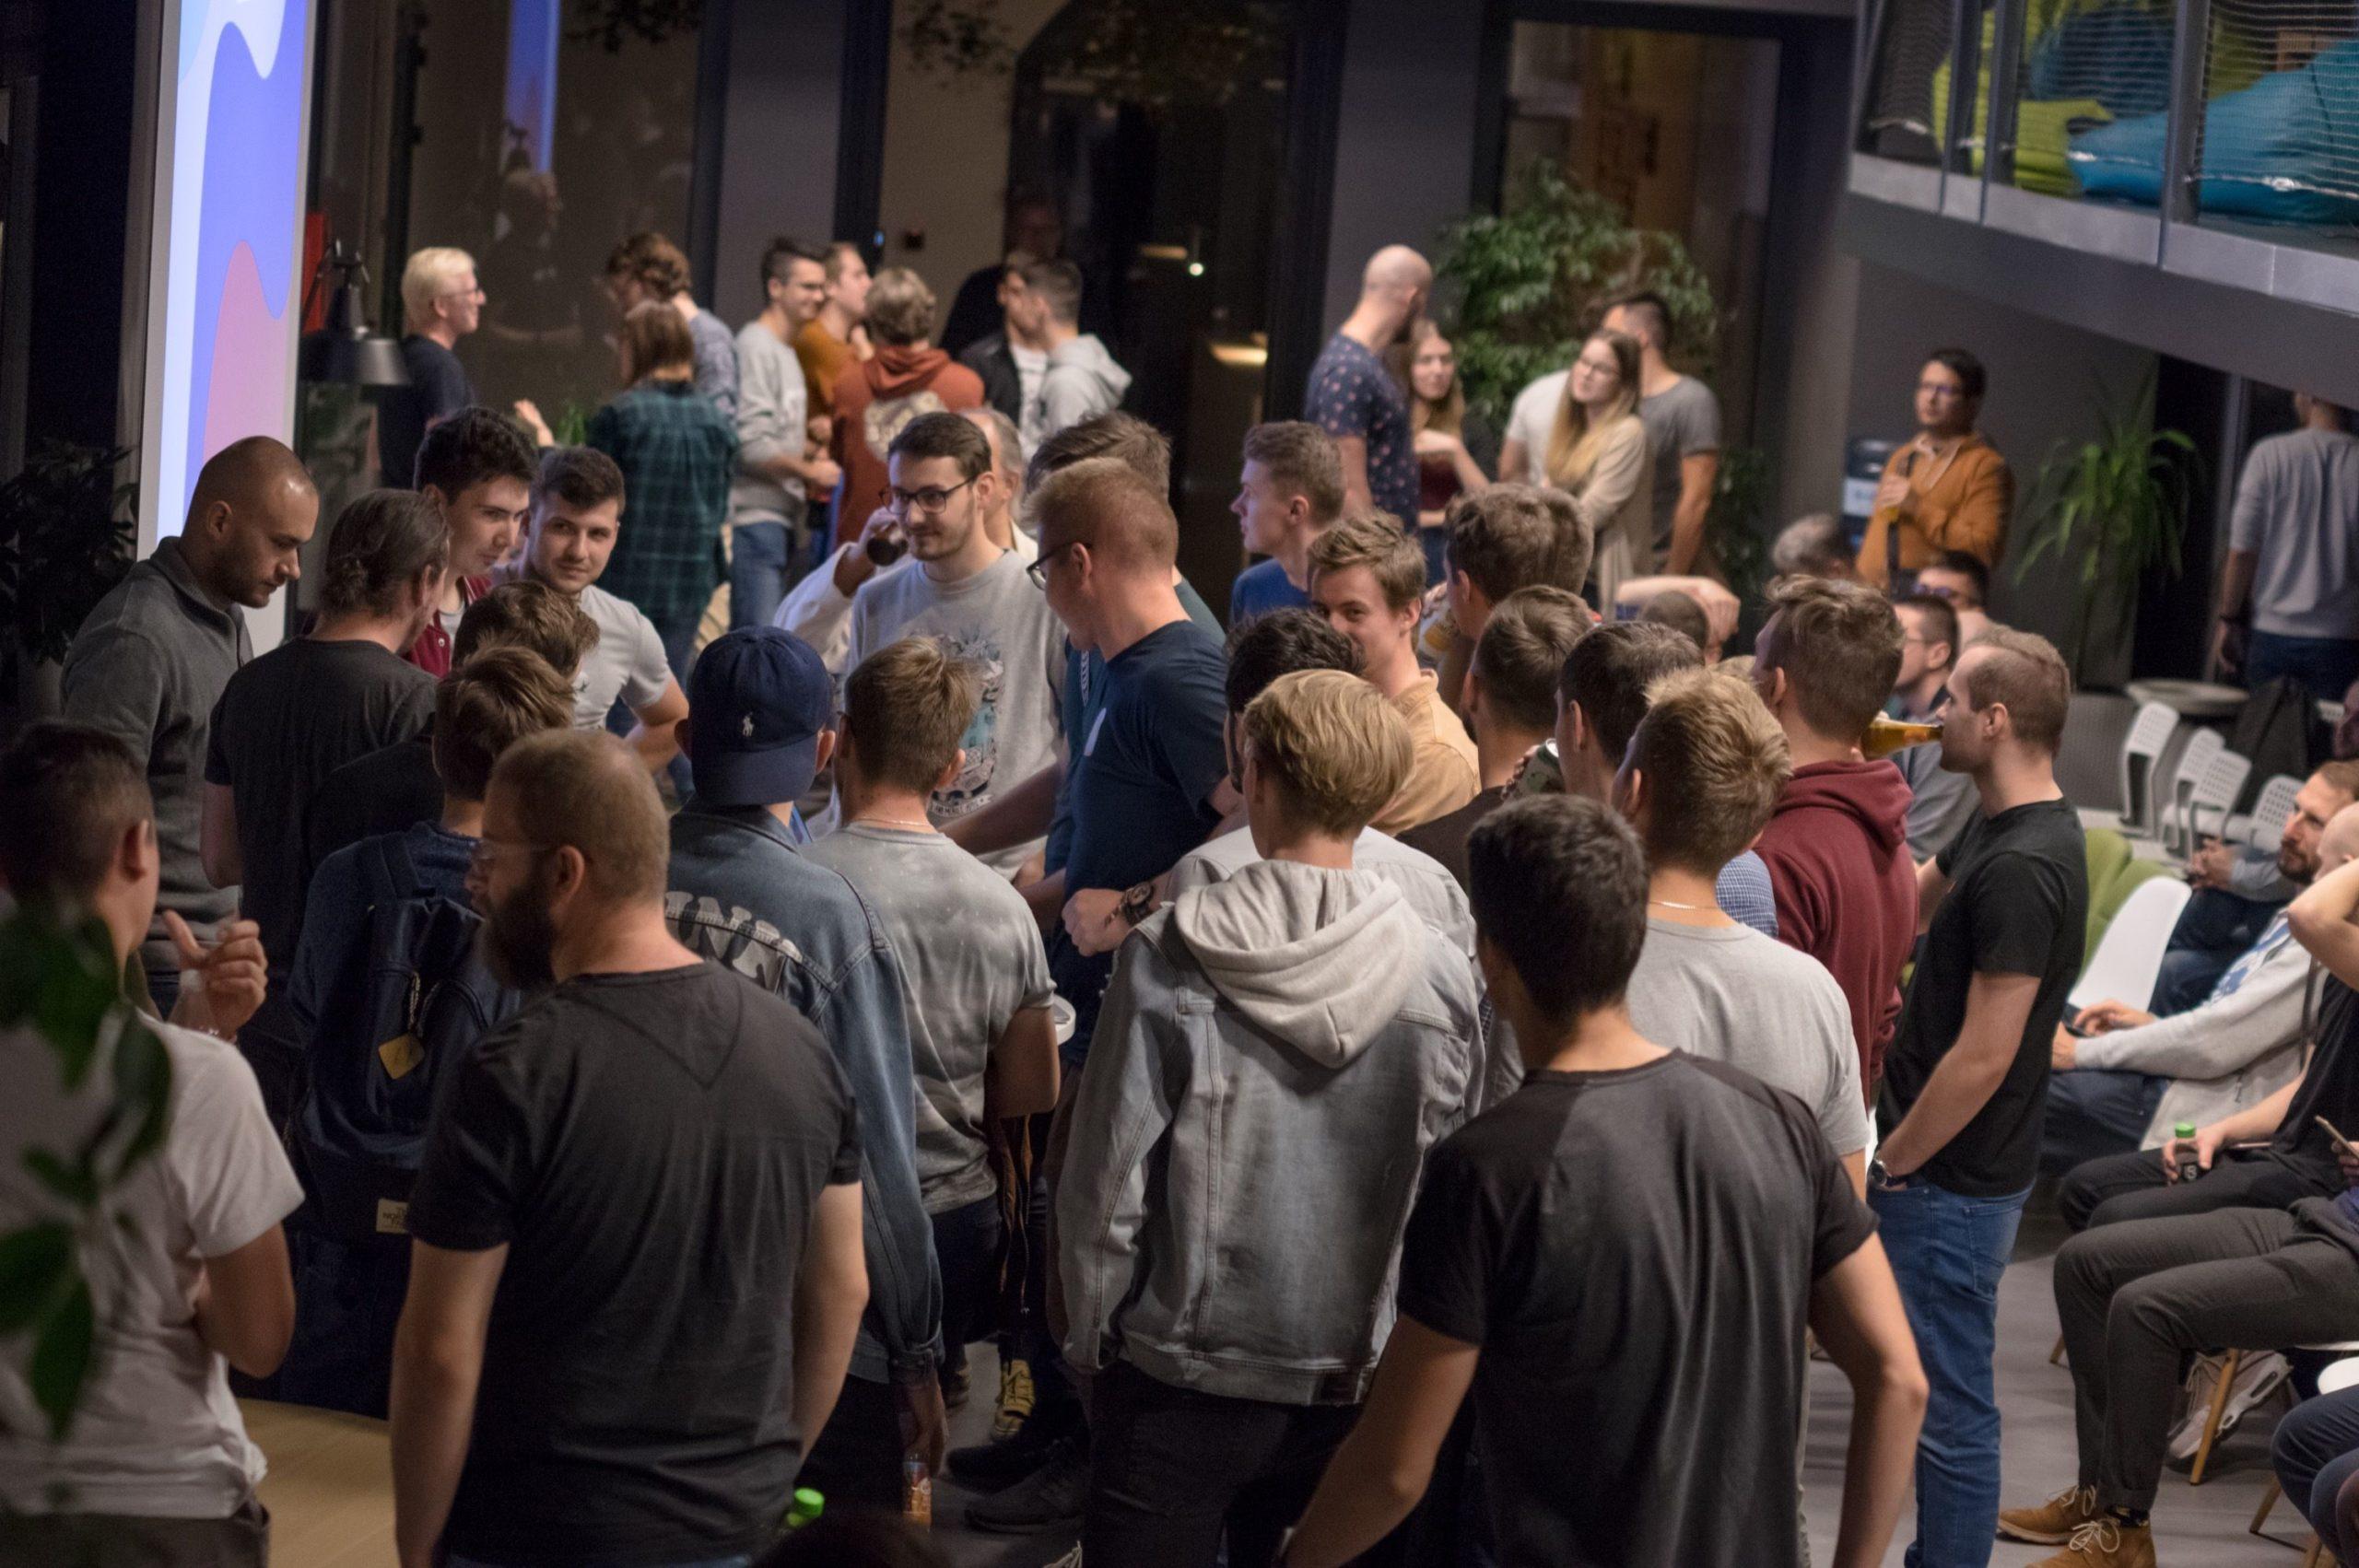 Uszanowanko programowanko local meetup Gliwice